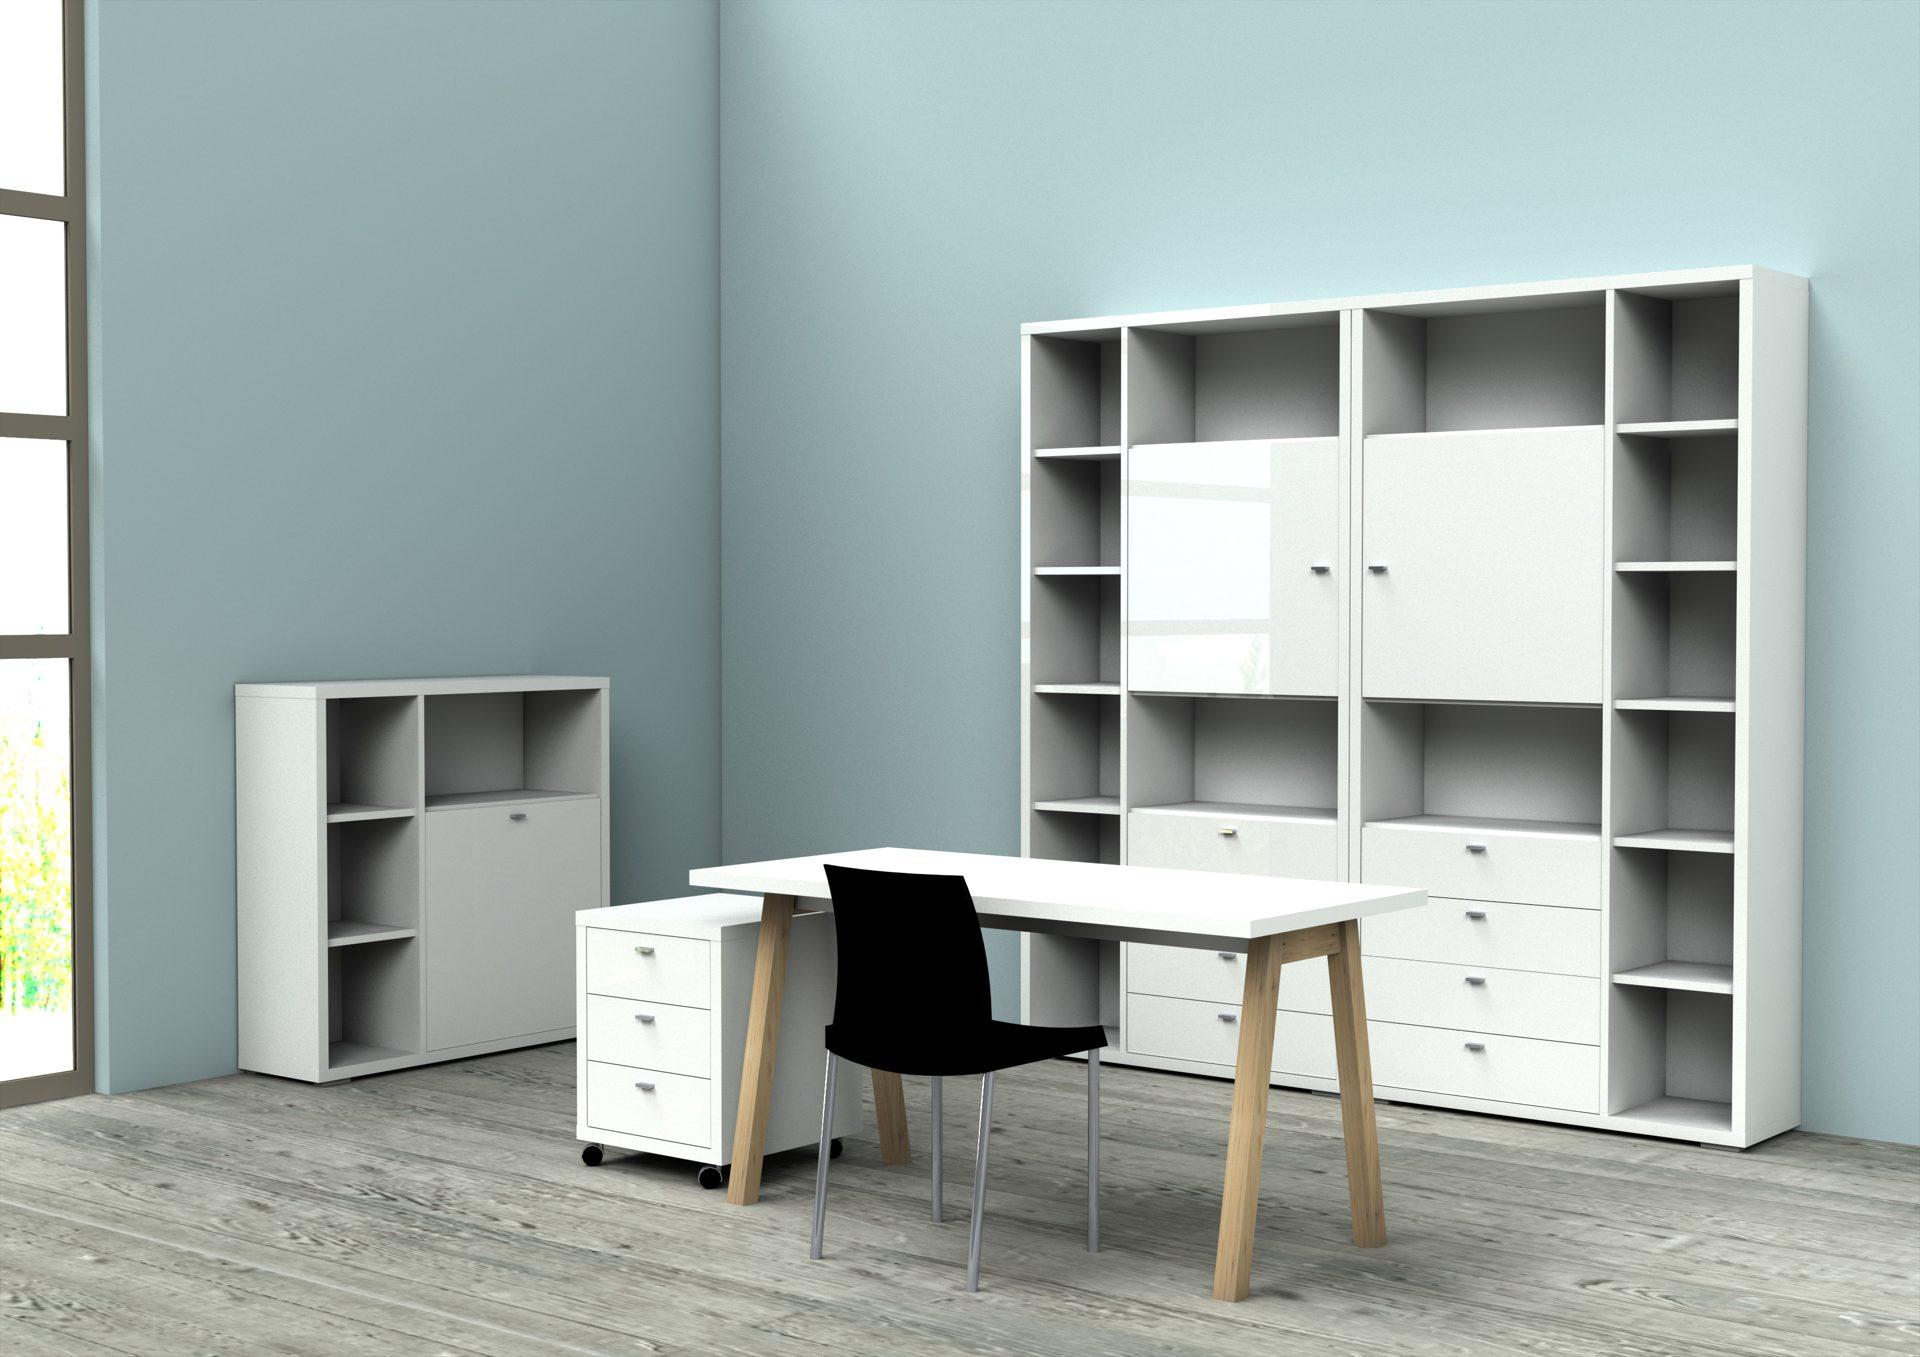 Büromöbel weiß günstig  Einrichtungshaus Hansel Delbrück-Westenholz | Möbel A-Z | Regale + ...